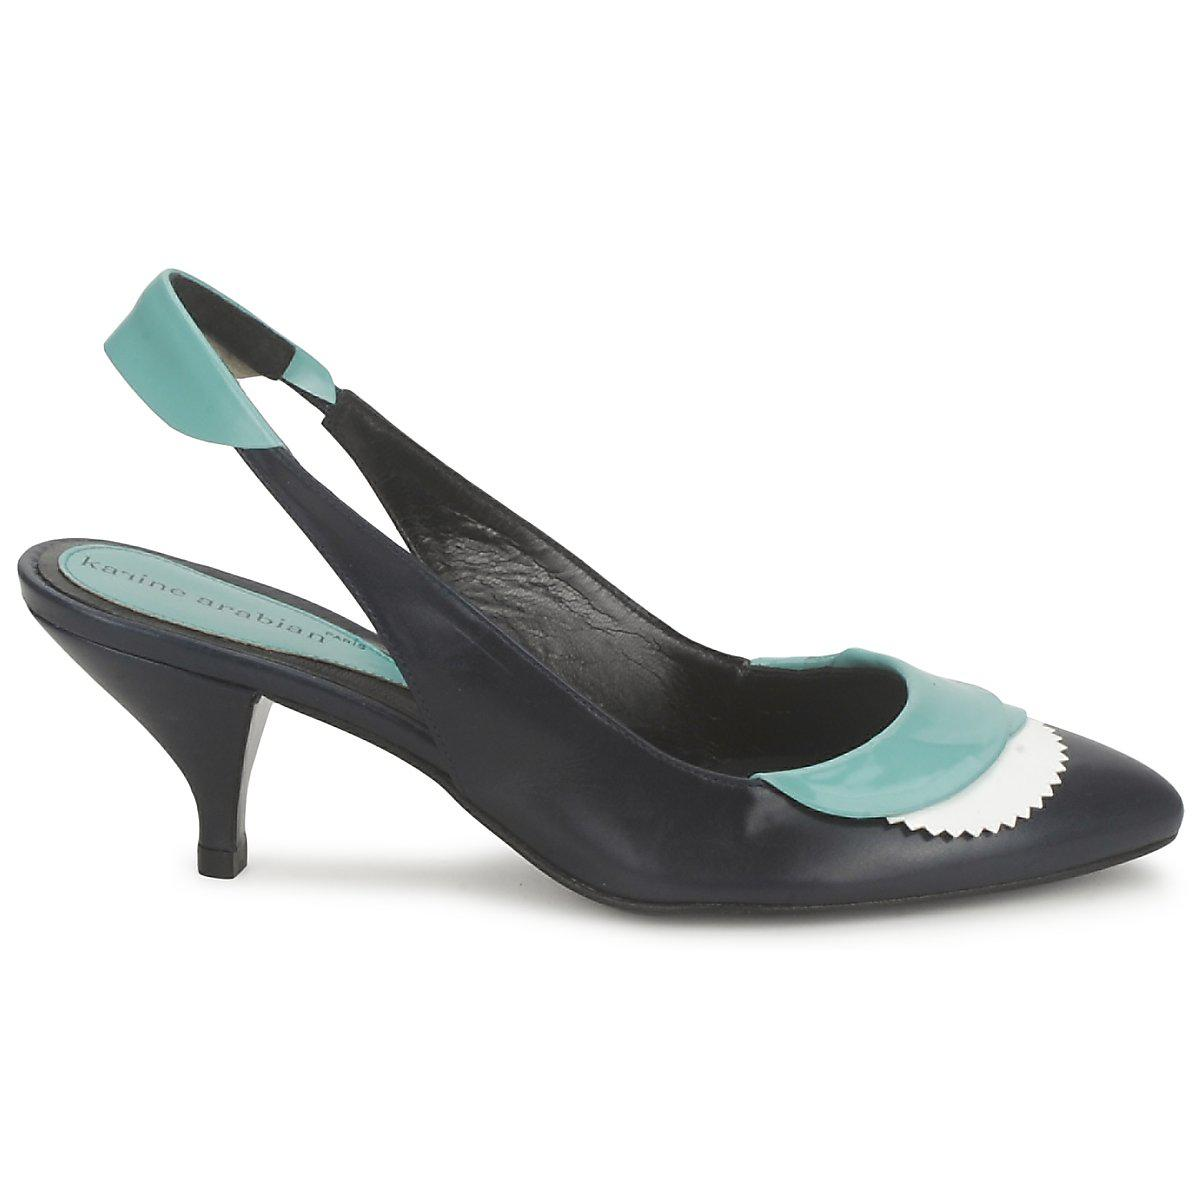 Lyst Lila Arabian Karine fullscreen View Black Sandals OPIddwESq